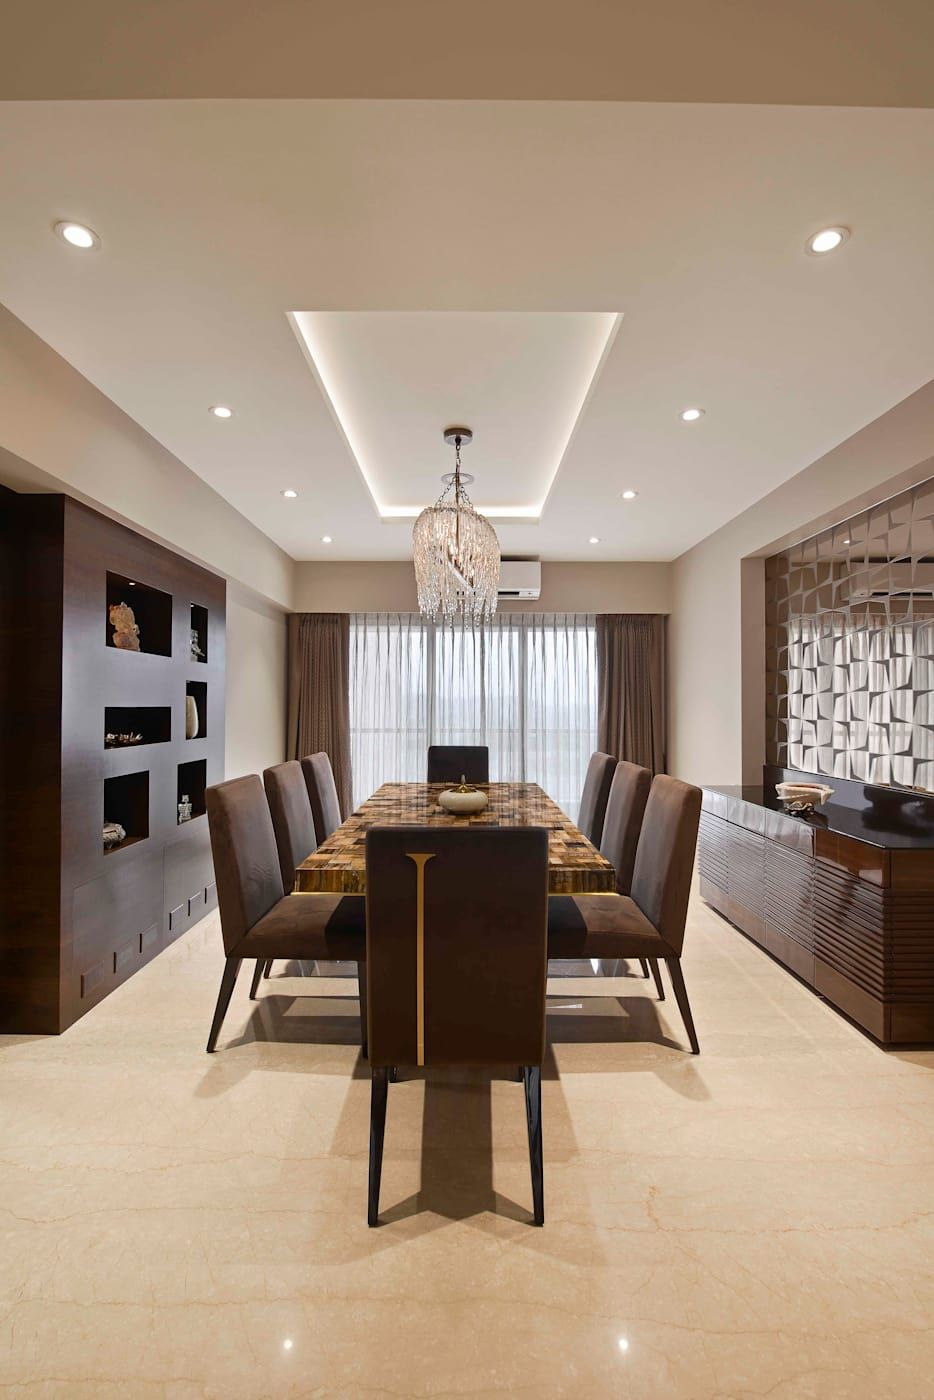 The Warm Bliss Minimalist Dining Room By Ar Milind Pai Minimalist